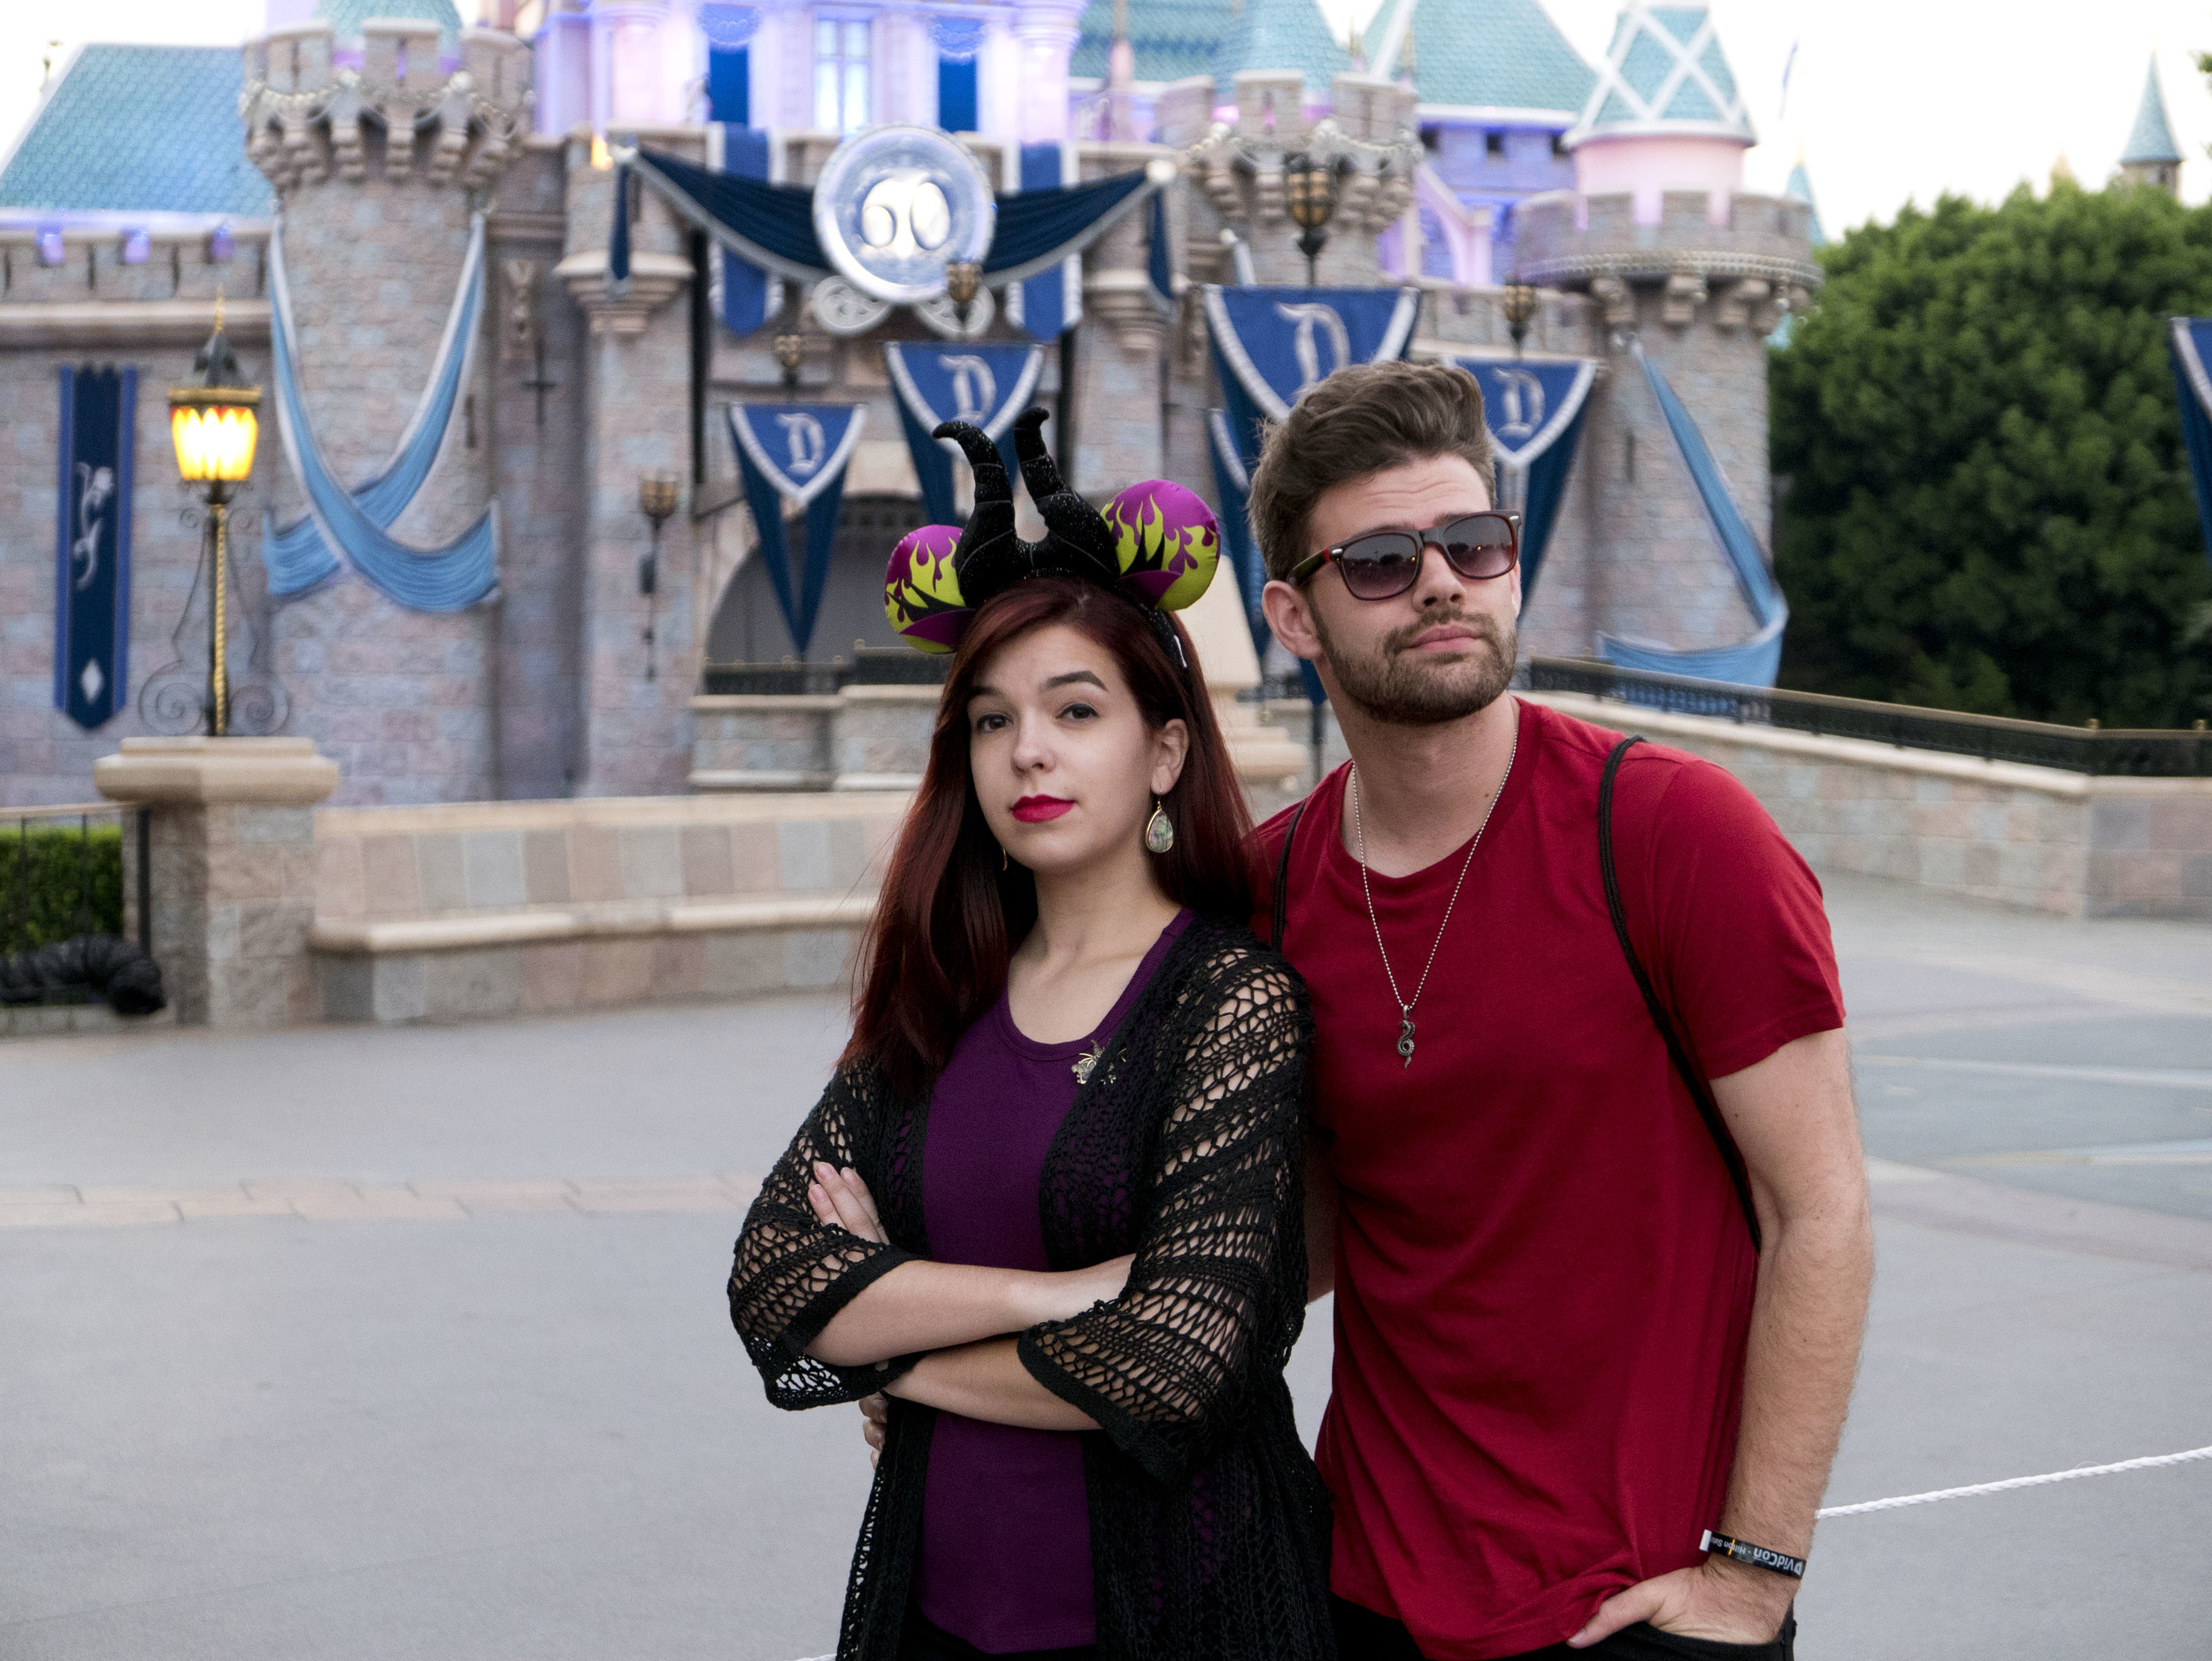 7-1-16 VidCon-Disney 376.jpg